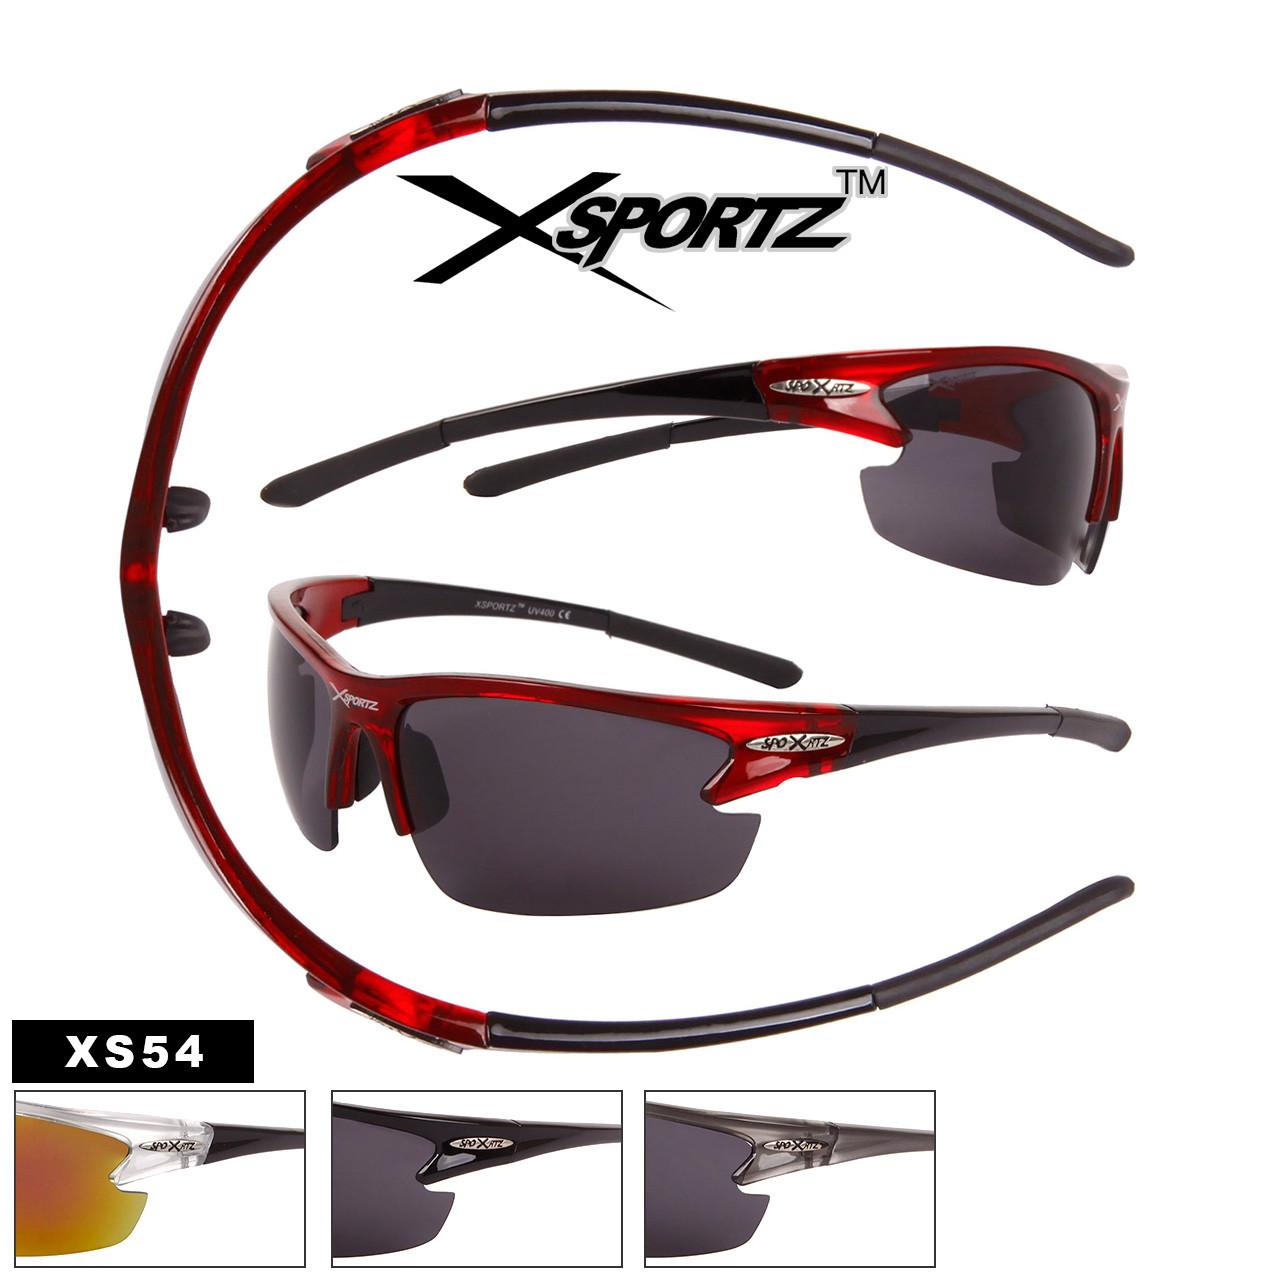 Wholesale Xsportz™ Sports Sunglasses - Style #XS54